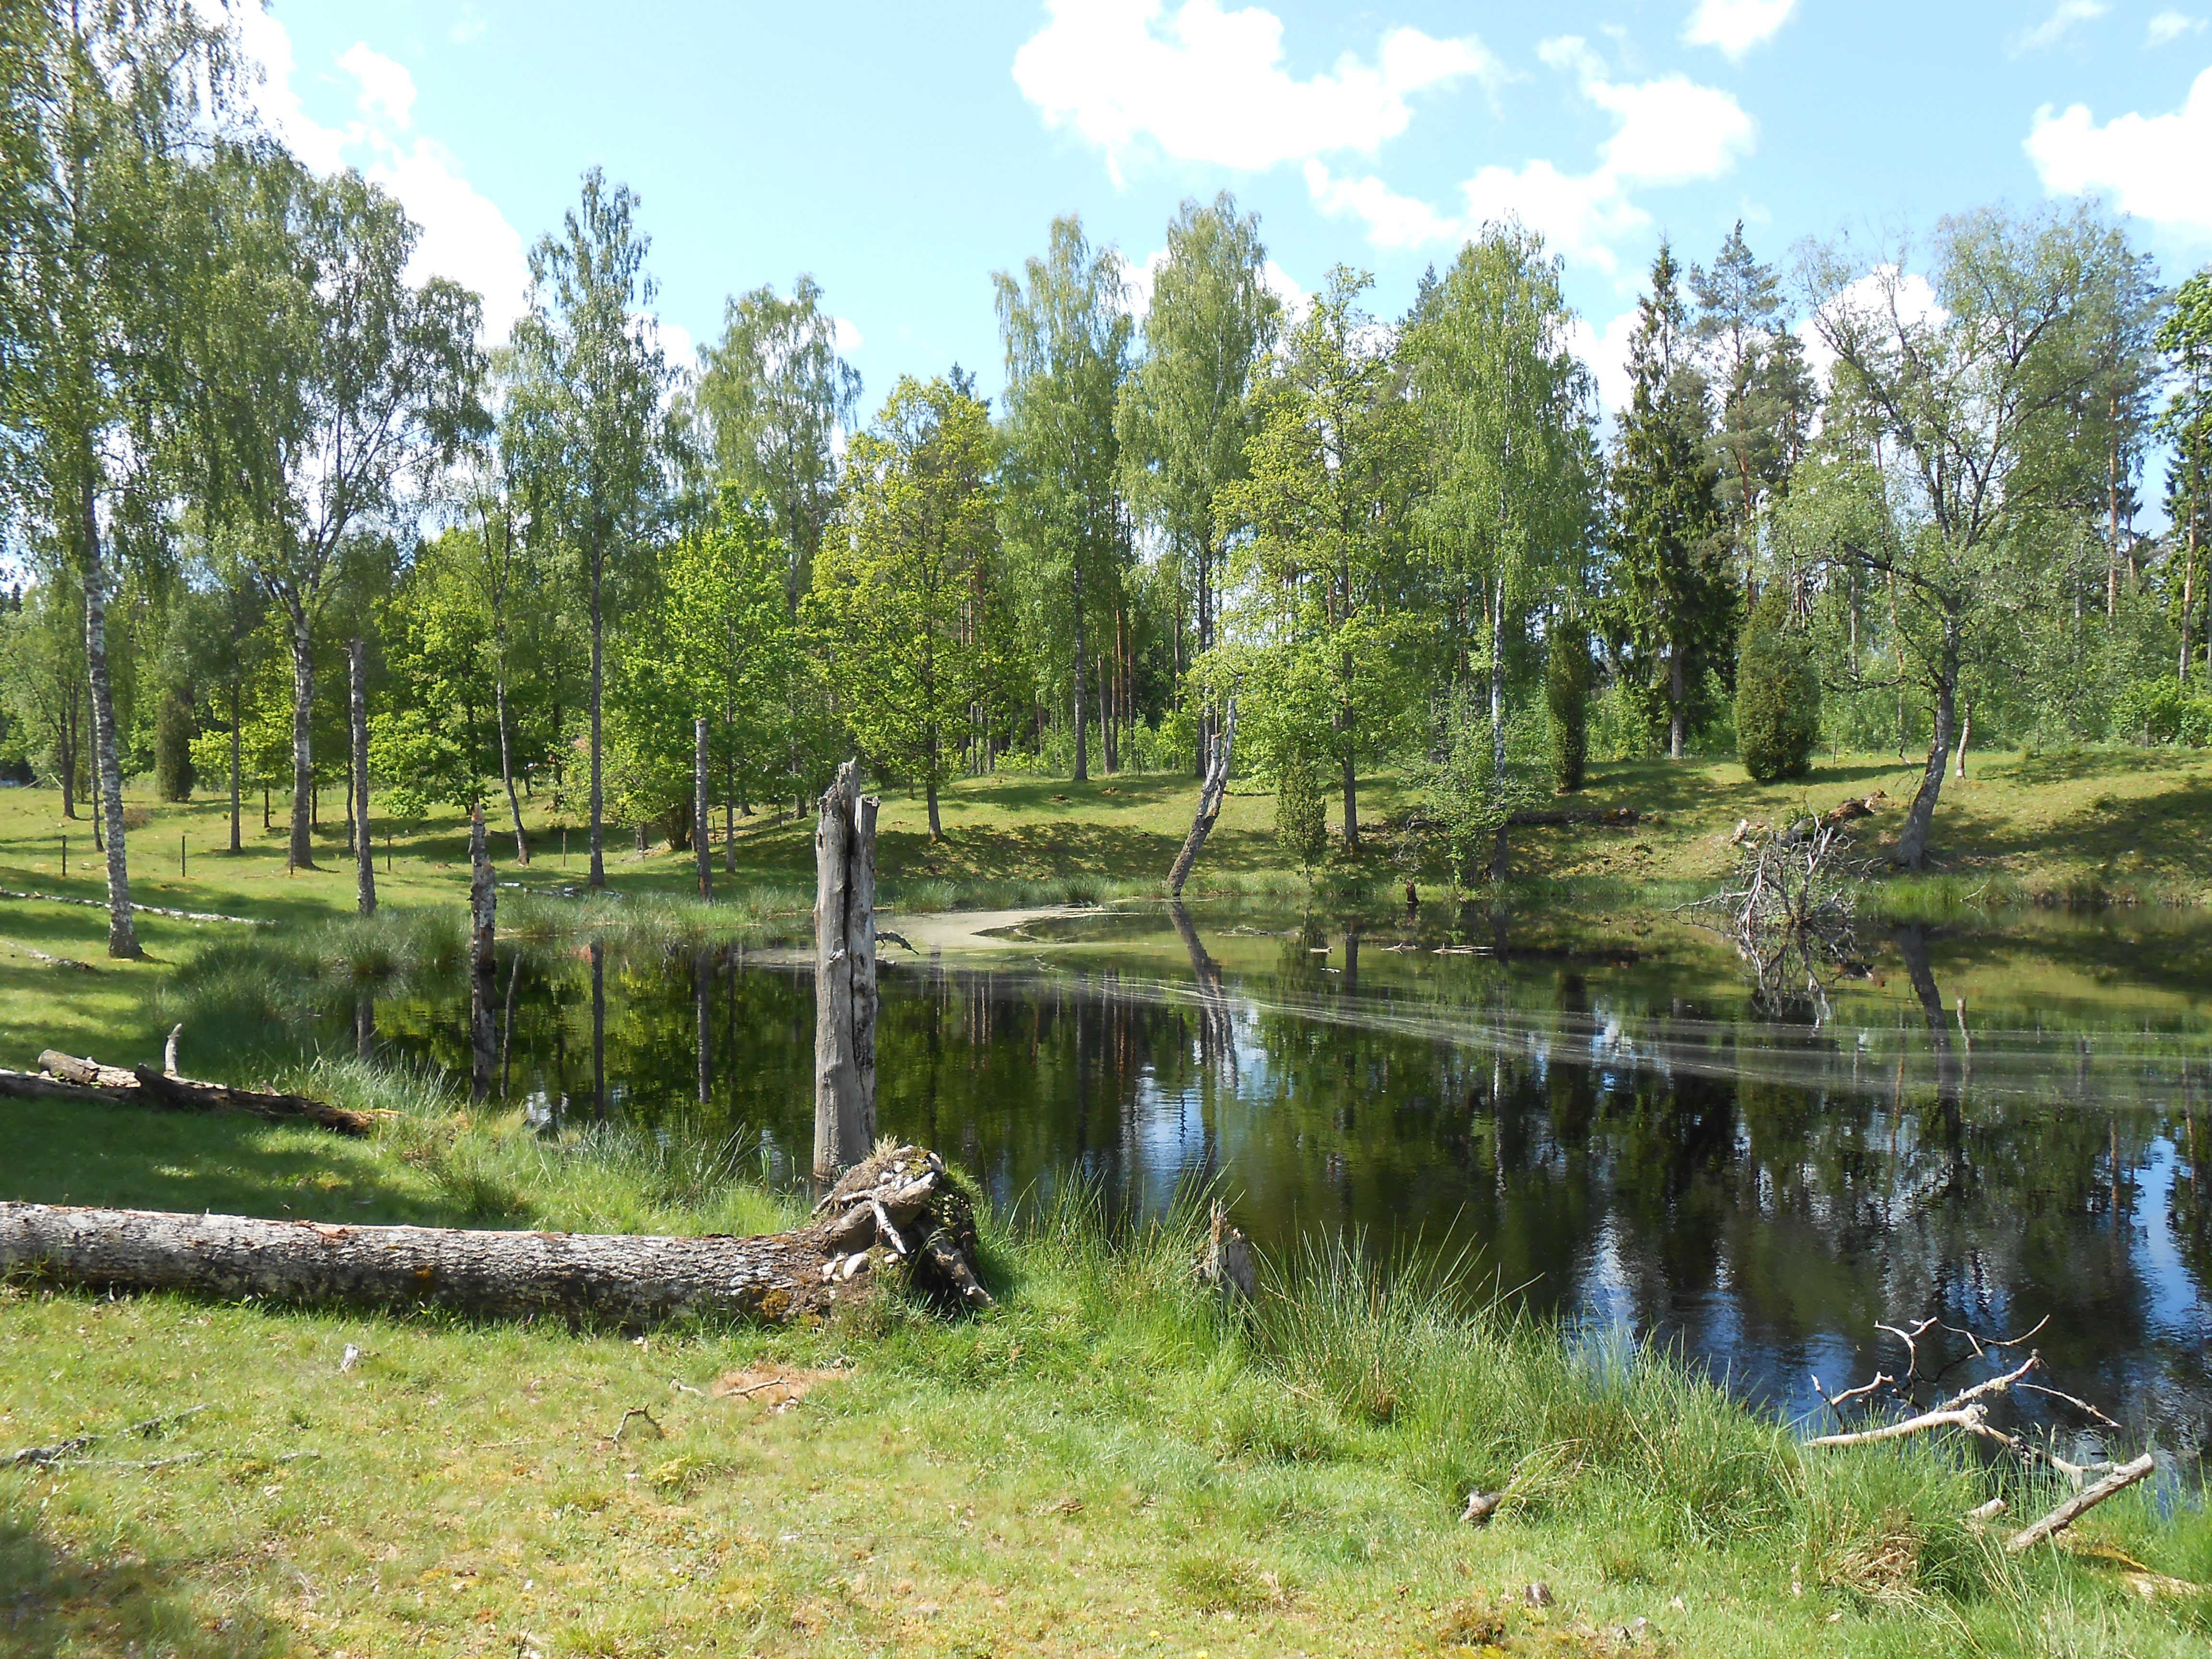 Korrö nature reserve